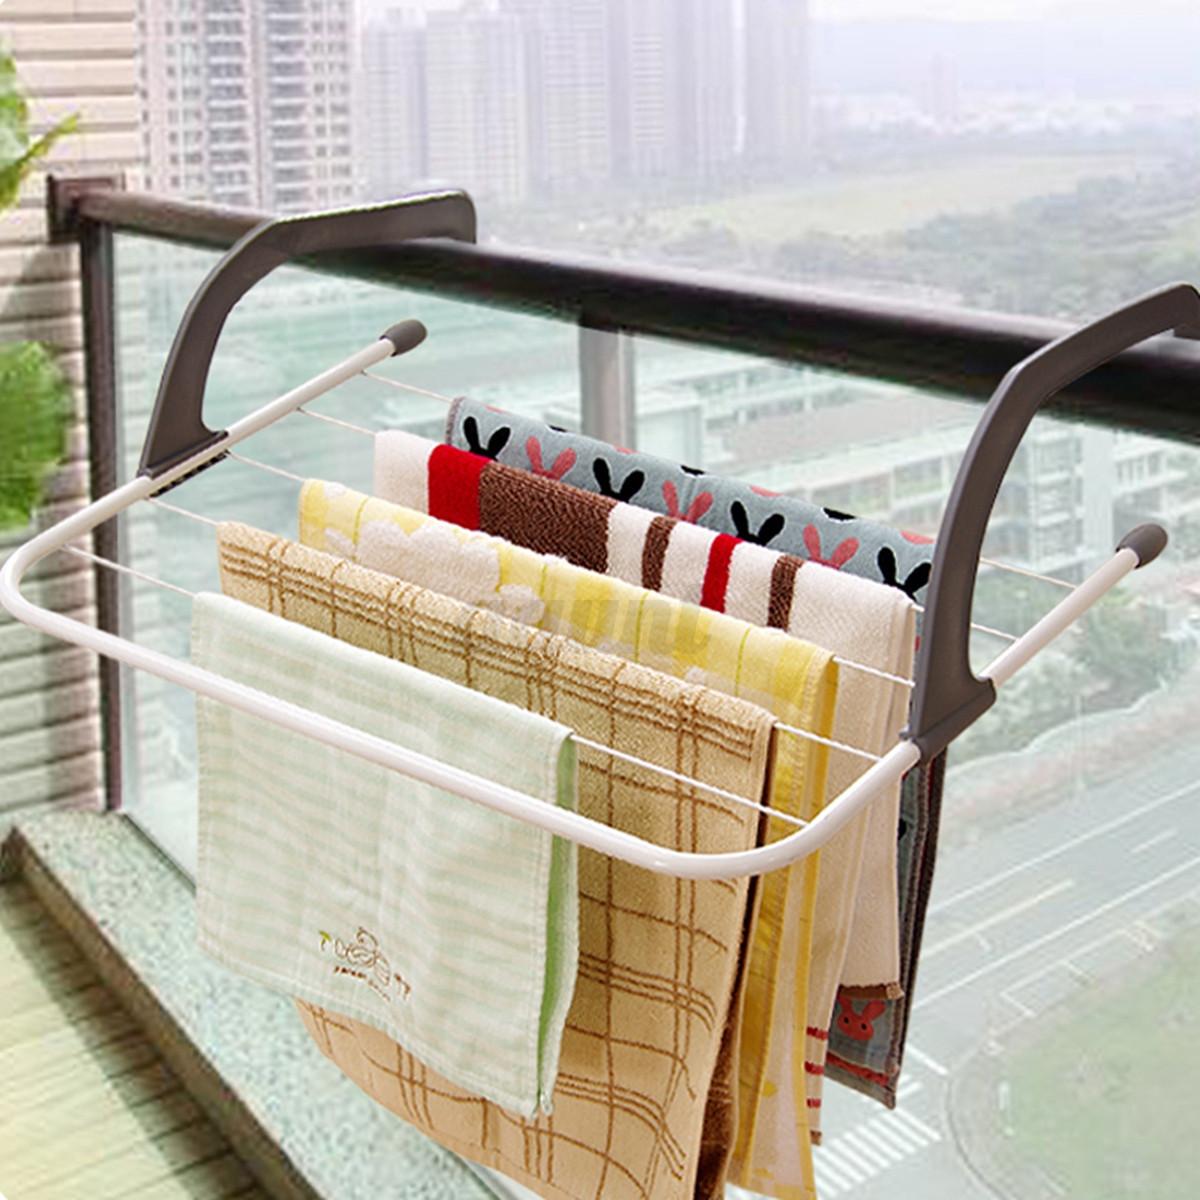 folding clothes rack drying laundry multifunction hanger. Black Bedroom Furniture Sets. Home Design Ideas